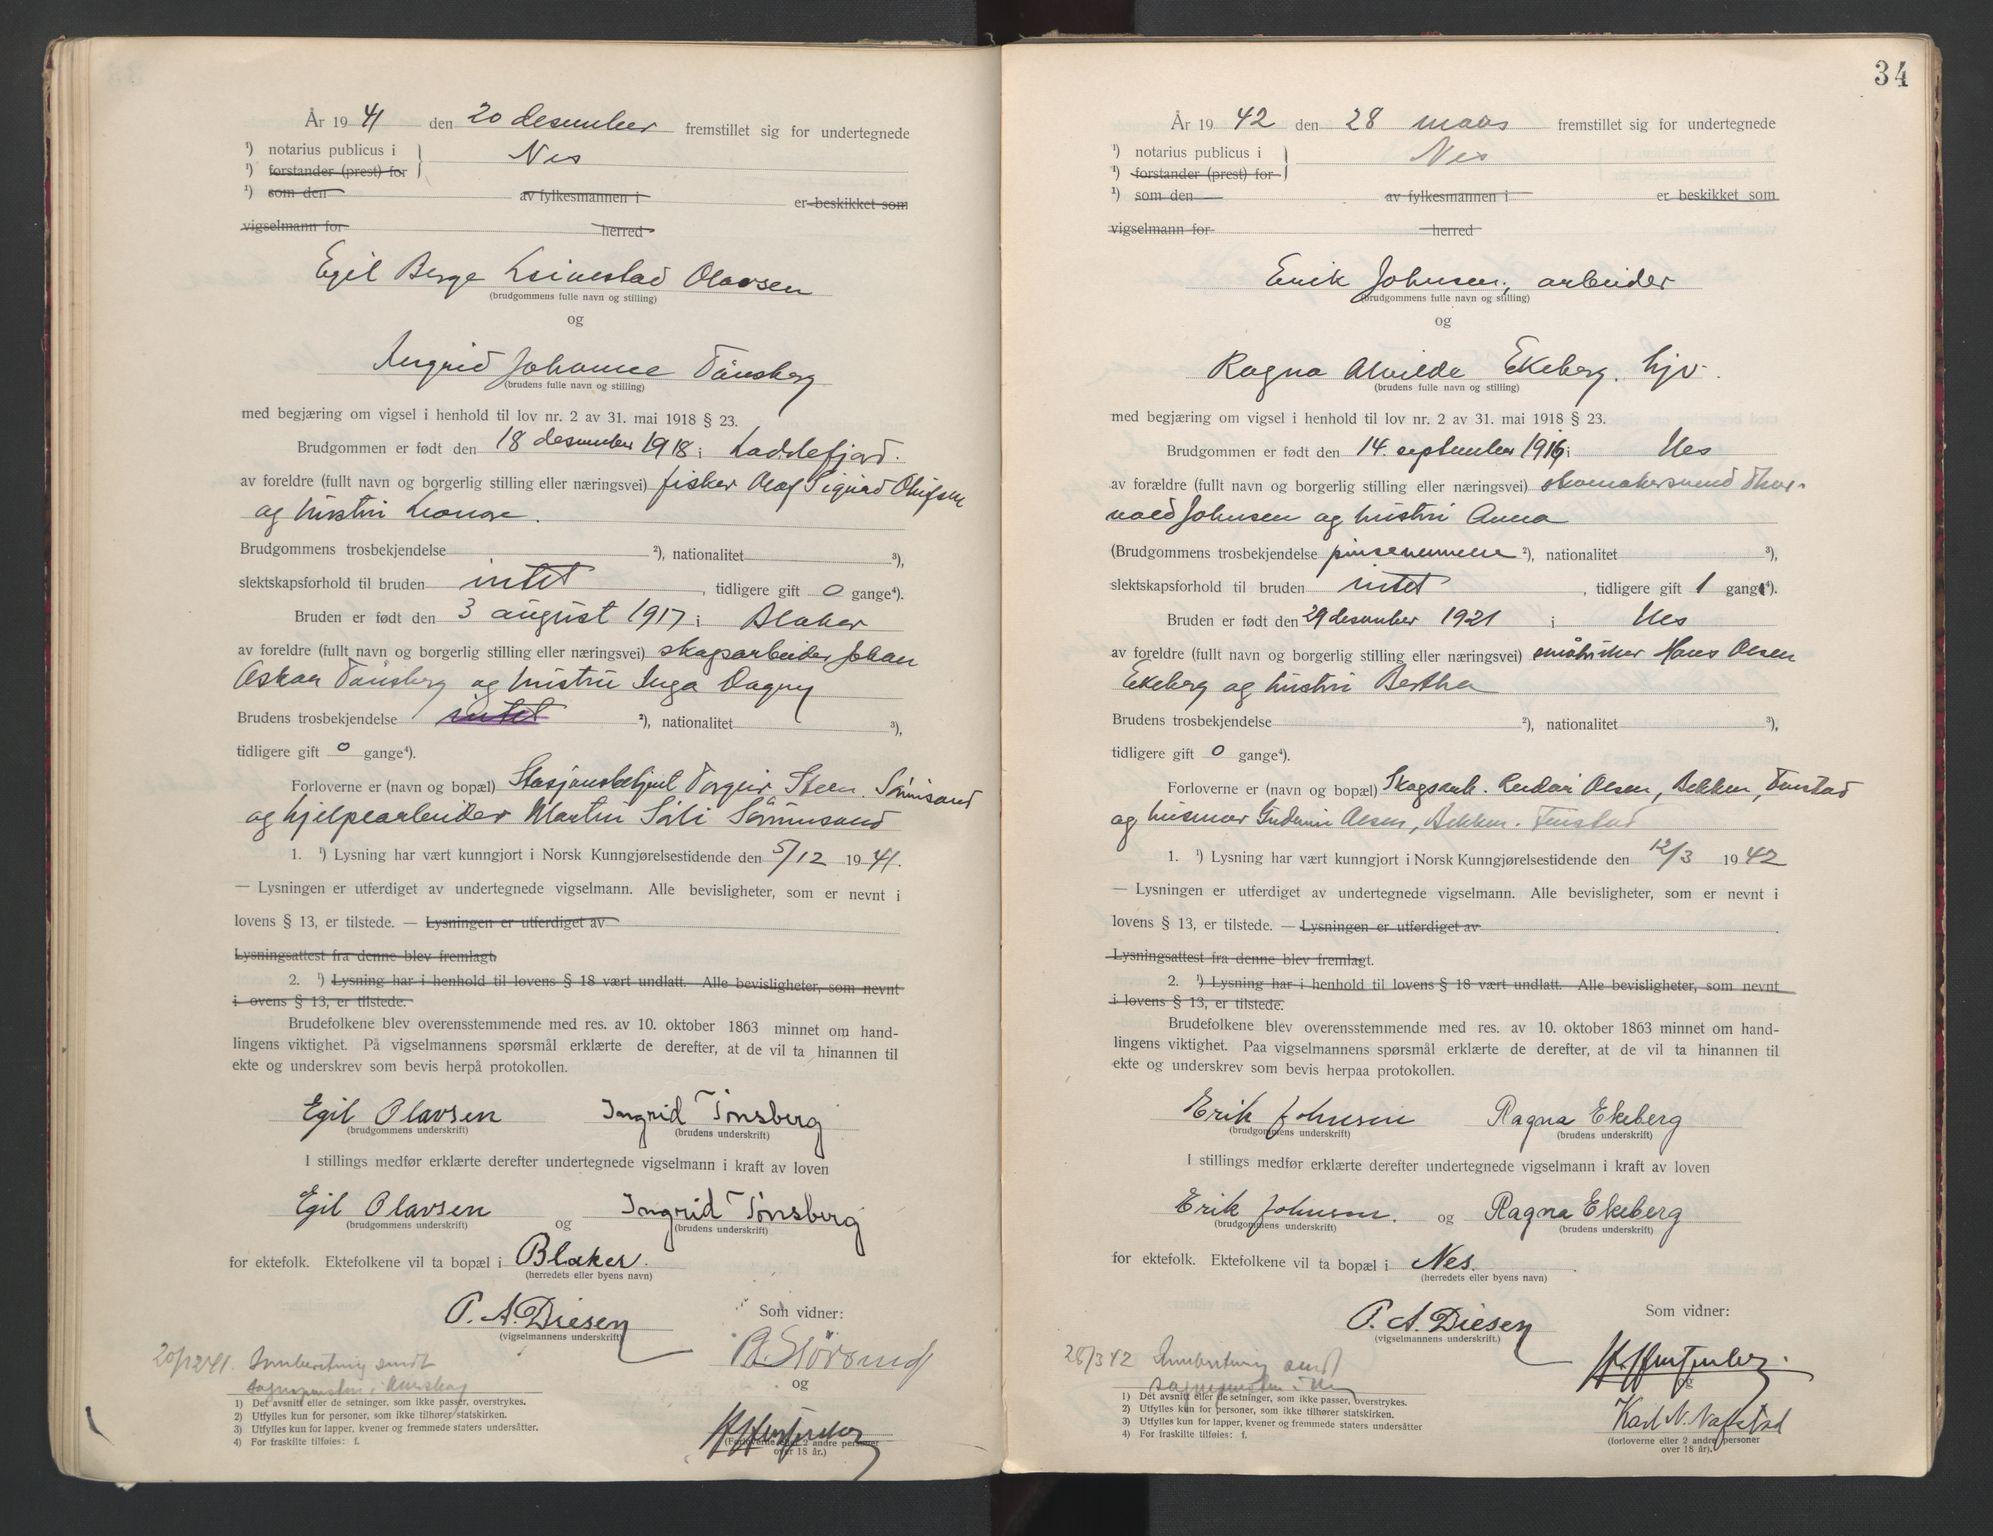 SAO, Nes tingrett, L/Lc/Lca/L0001: Vigselbok, 1920-1943, s. 34